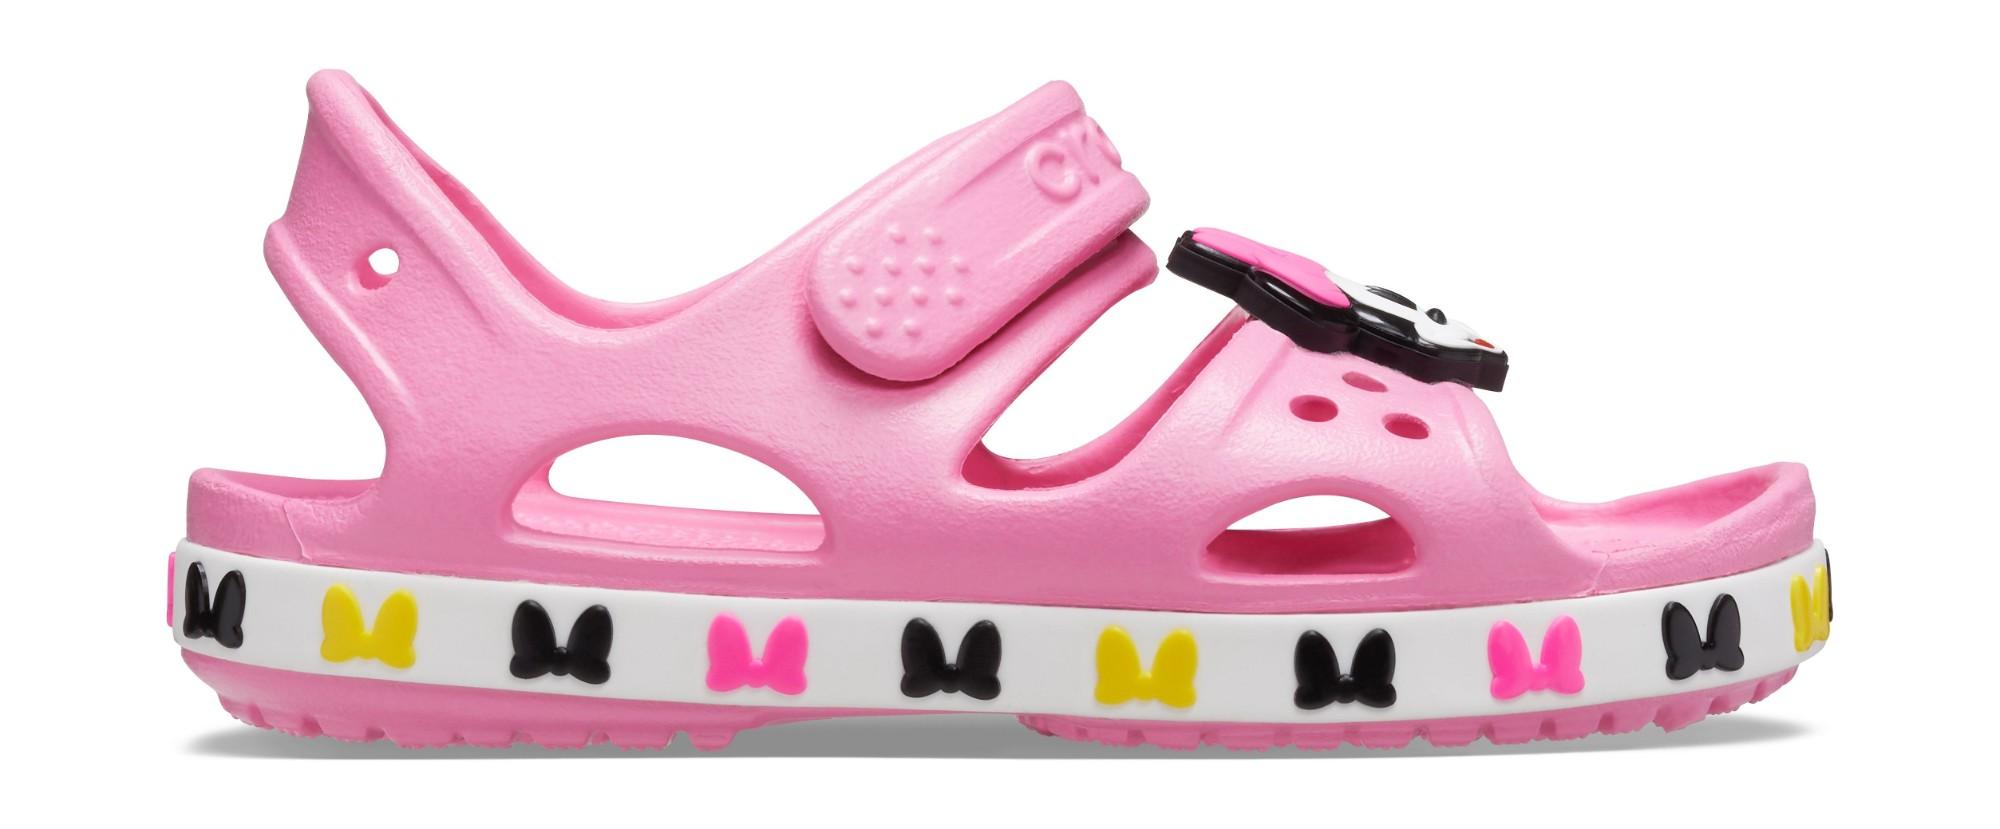 Crocs™ Kids' Fun Lab Crocband Minnie Mouse Sandal Pink Lemonade 26